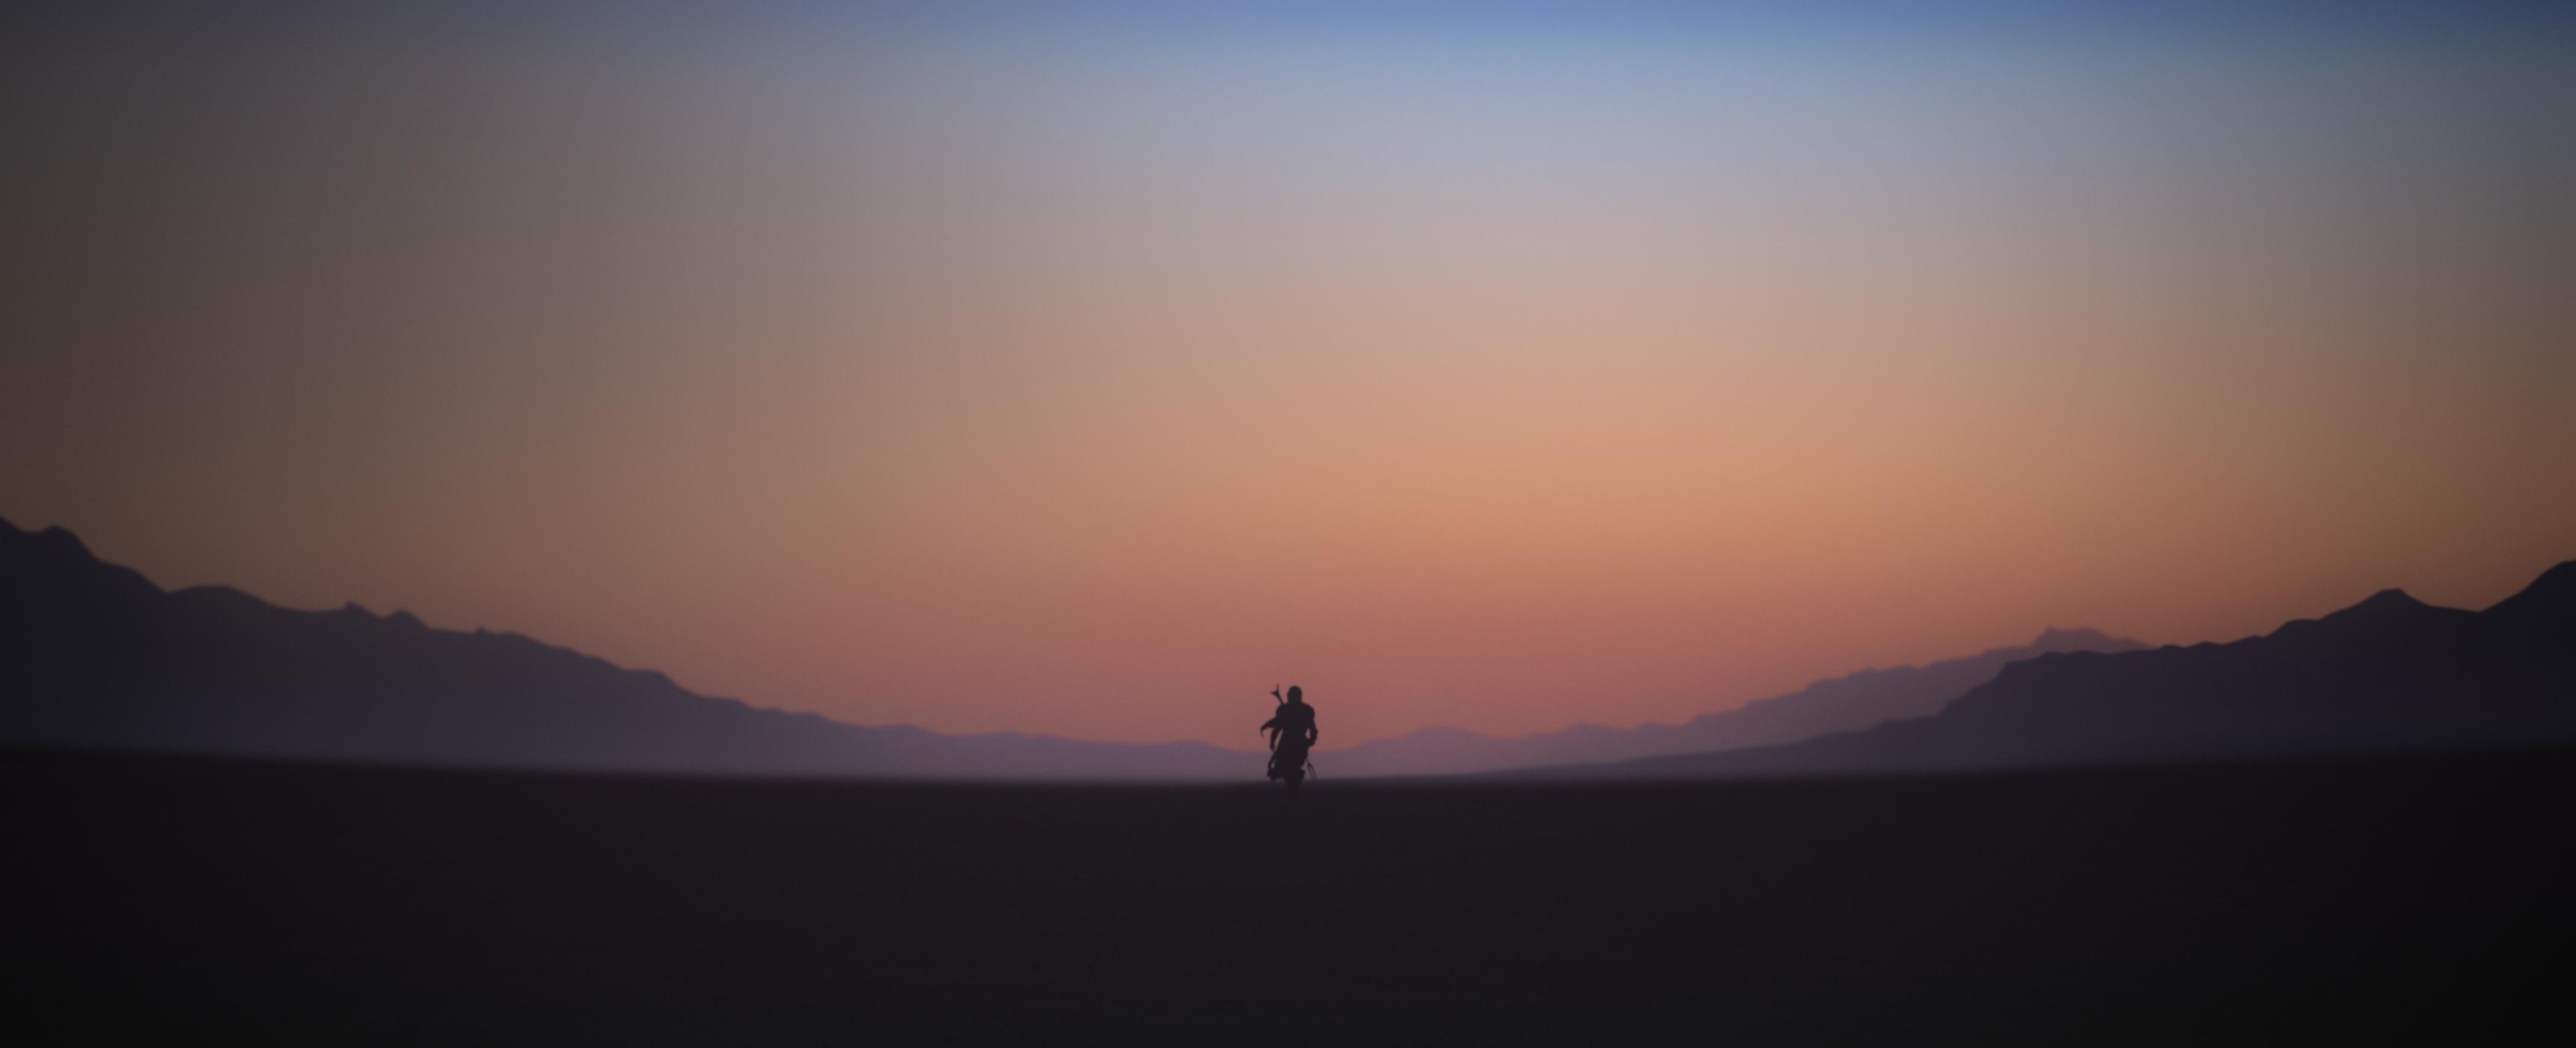 Wallpaper Louis Coyle Fantasy Art Digital Art Ultra Wide The Mandalorian Desert Gradient Landscape Mountains Sunrise Illustration Vector Star Wars 3440x1400 Theprettyreckless 1942261 Hd Wallpapers Wallhere